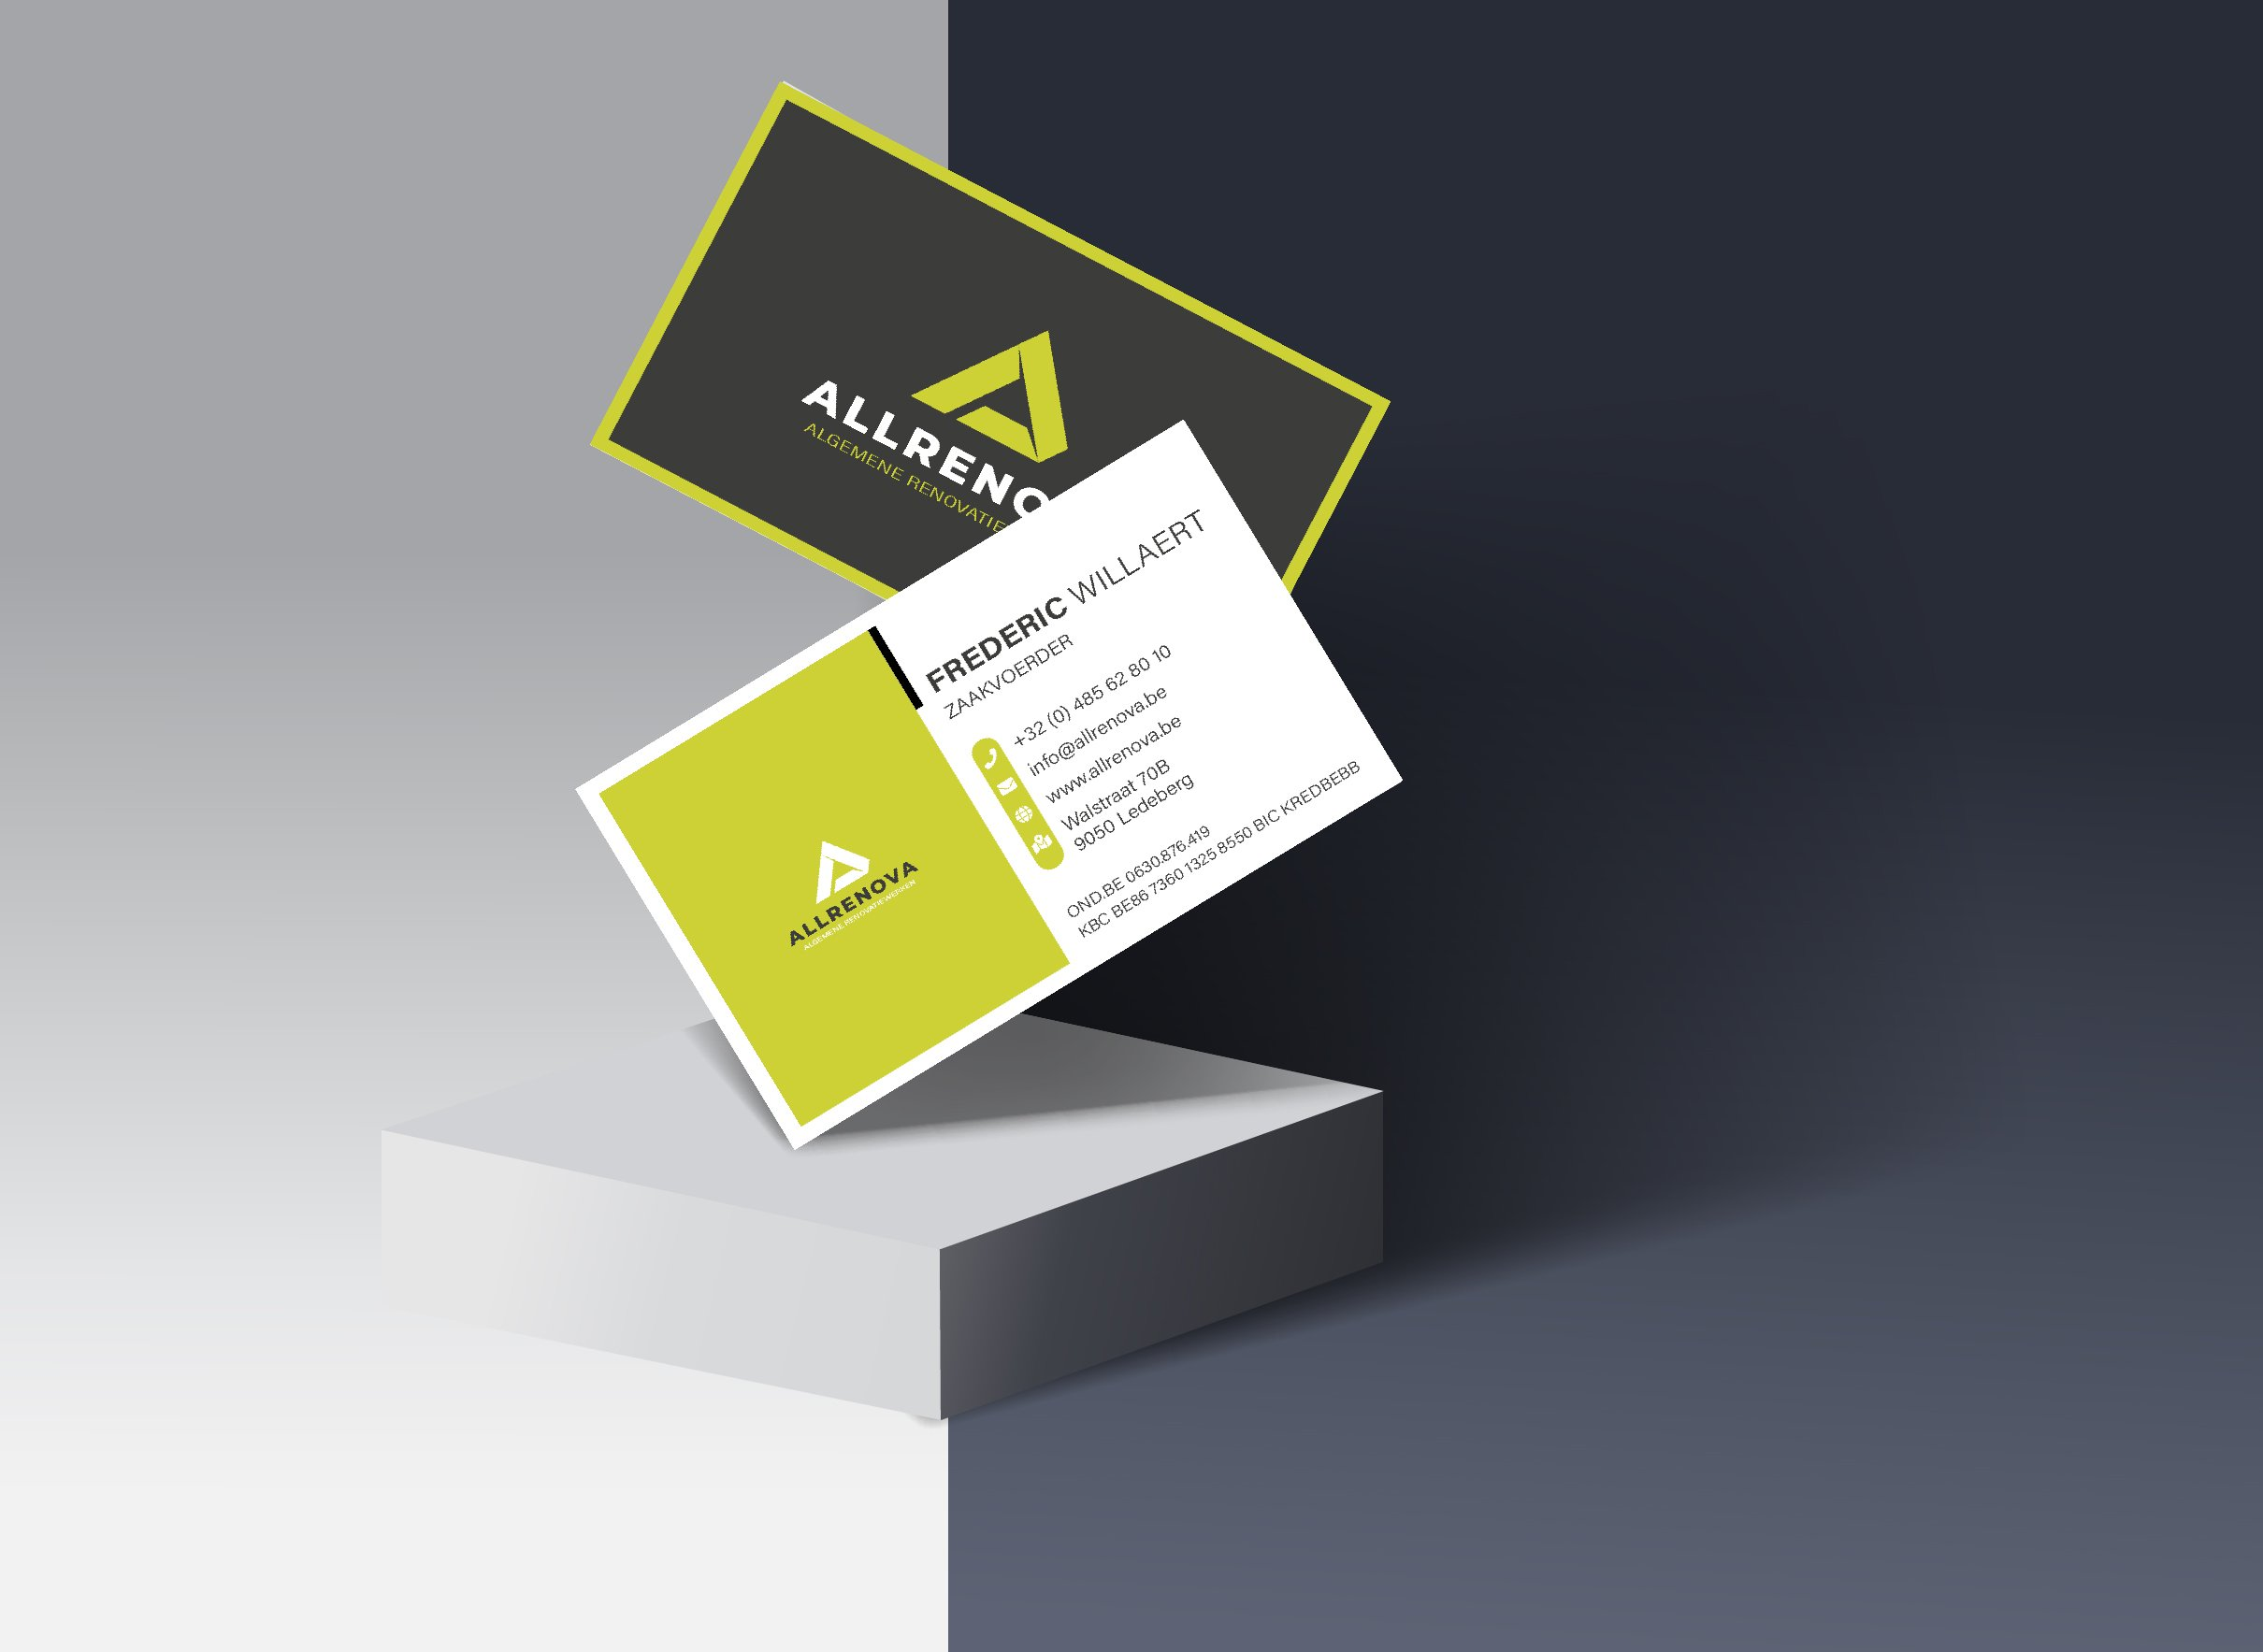 Mark-up-grafisch-ontwerp-naamkaartje-allrenova